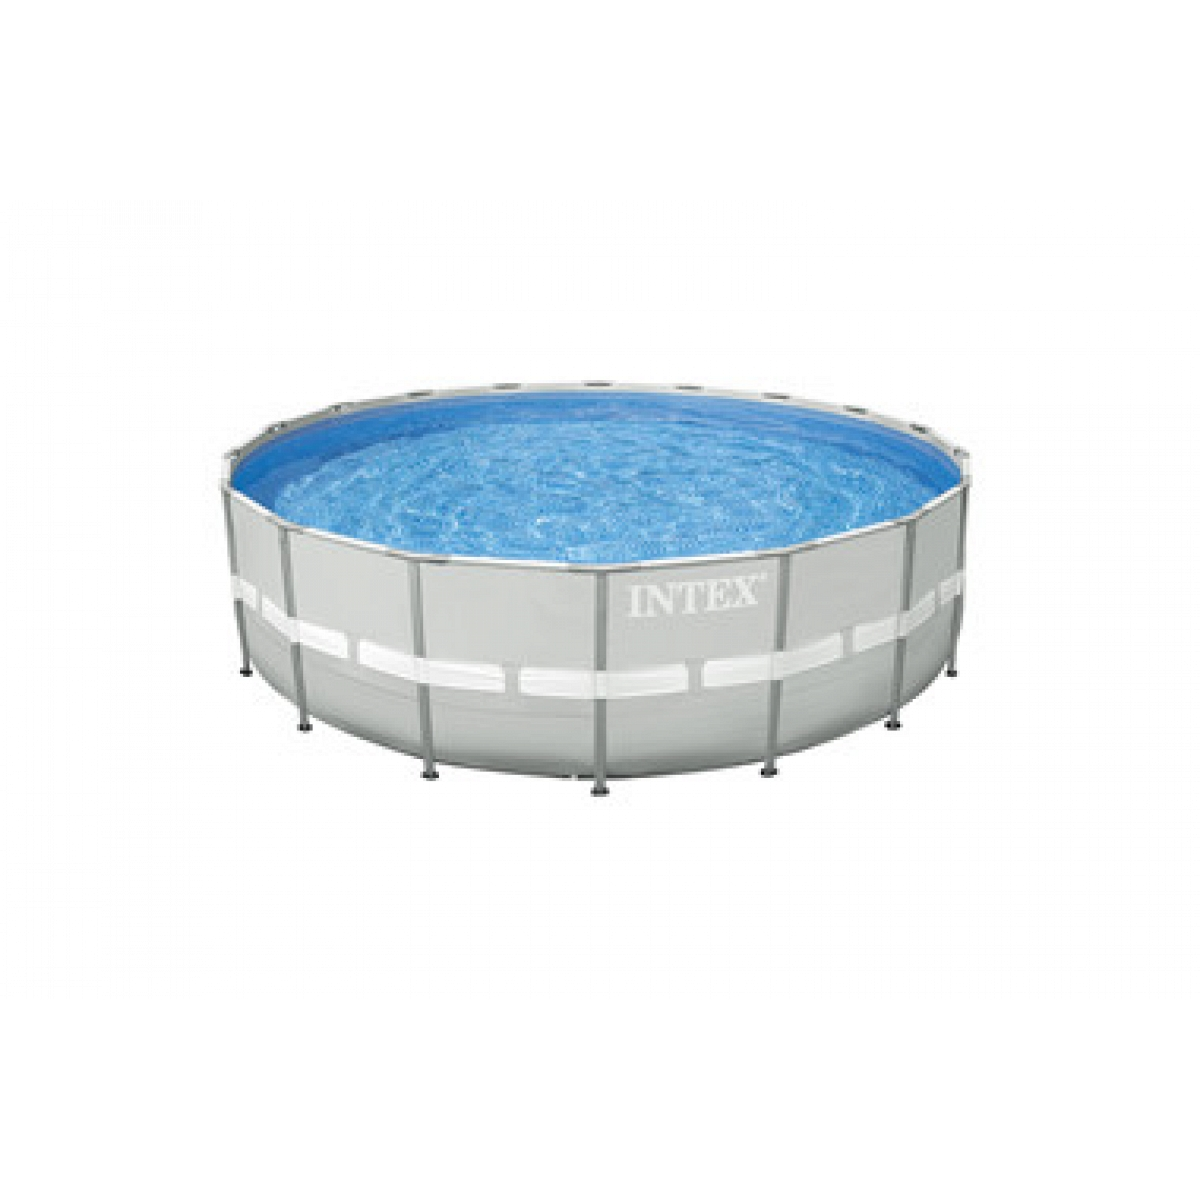 Piscina tonda fuoriterra intex 488x122 mod ultra frame con - Filtri per piscine fuori terra ...